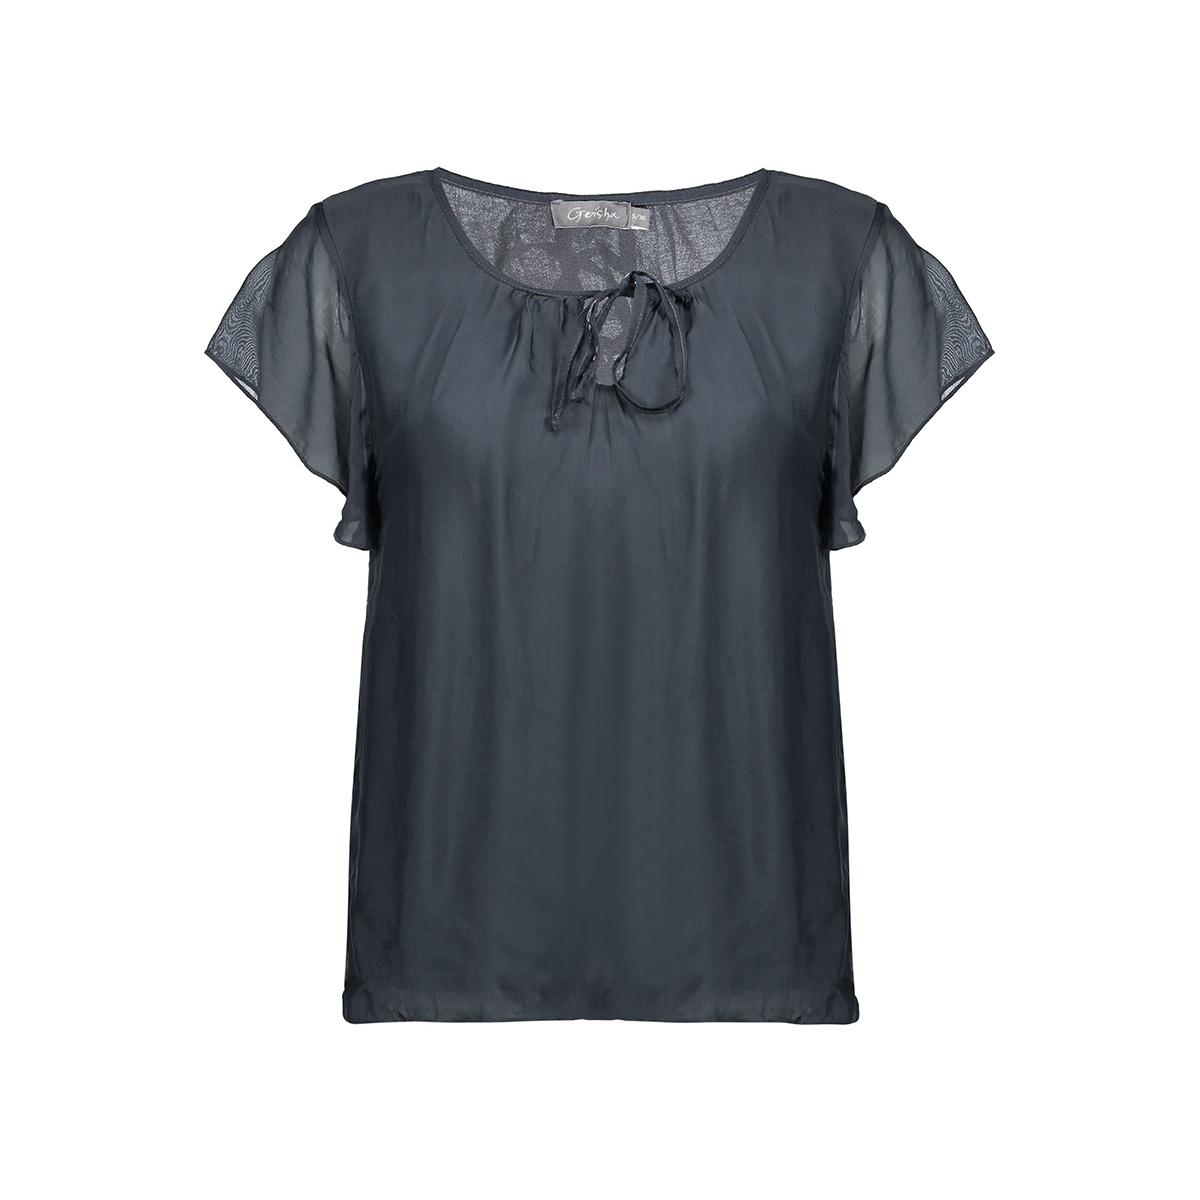 top silk with ruffles 03290 70 geisha t-shirt anthracite